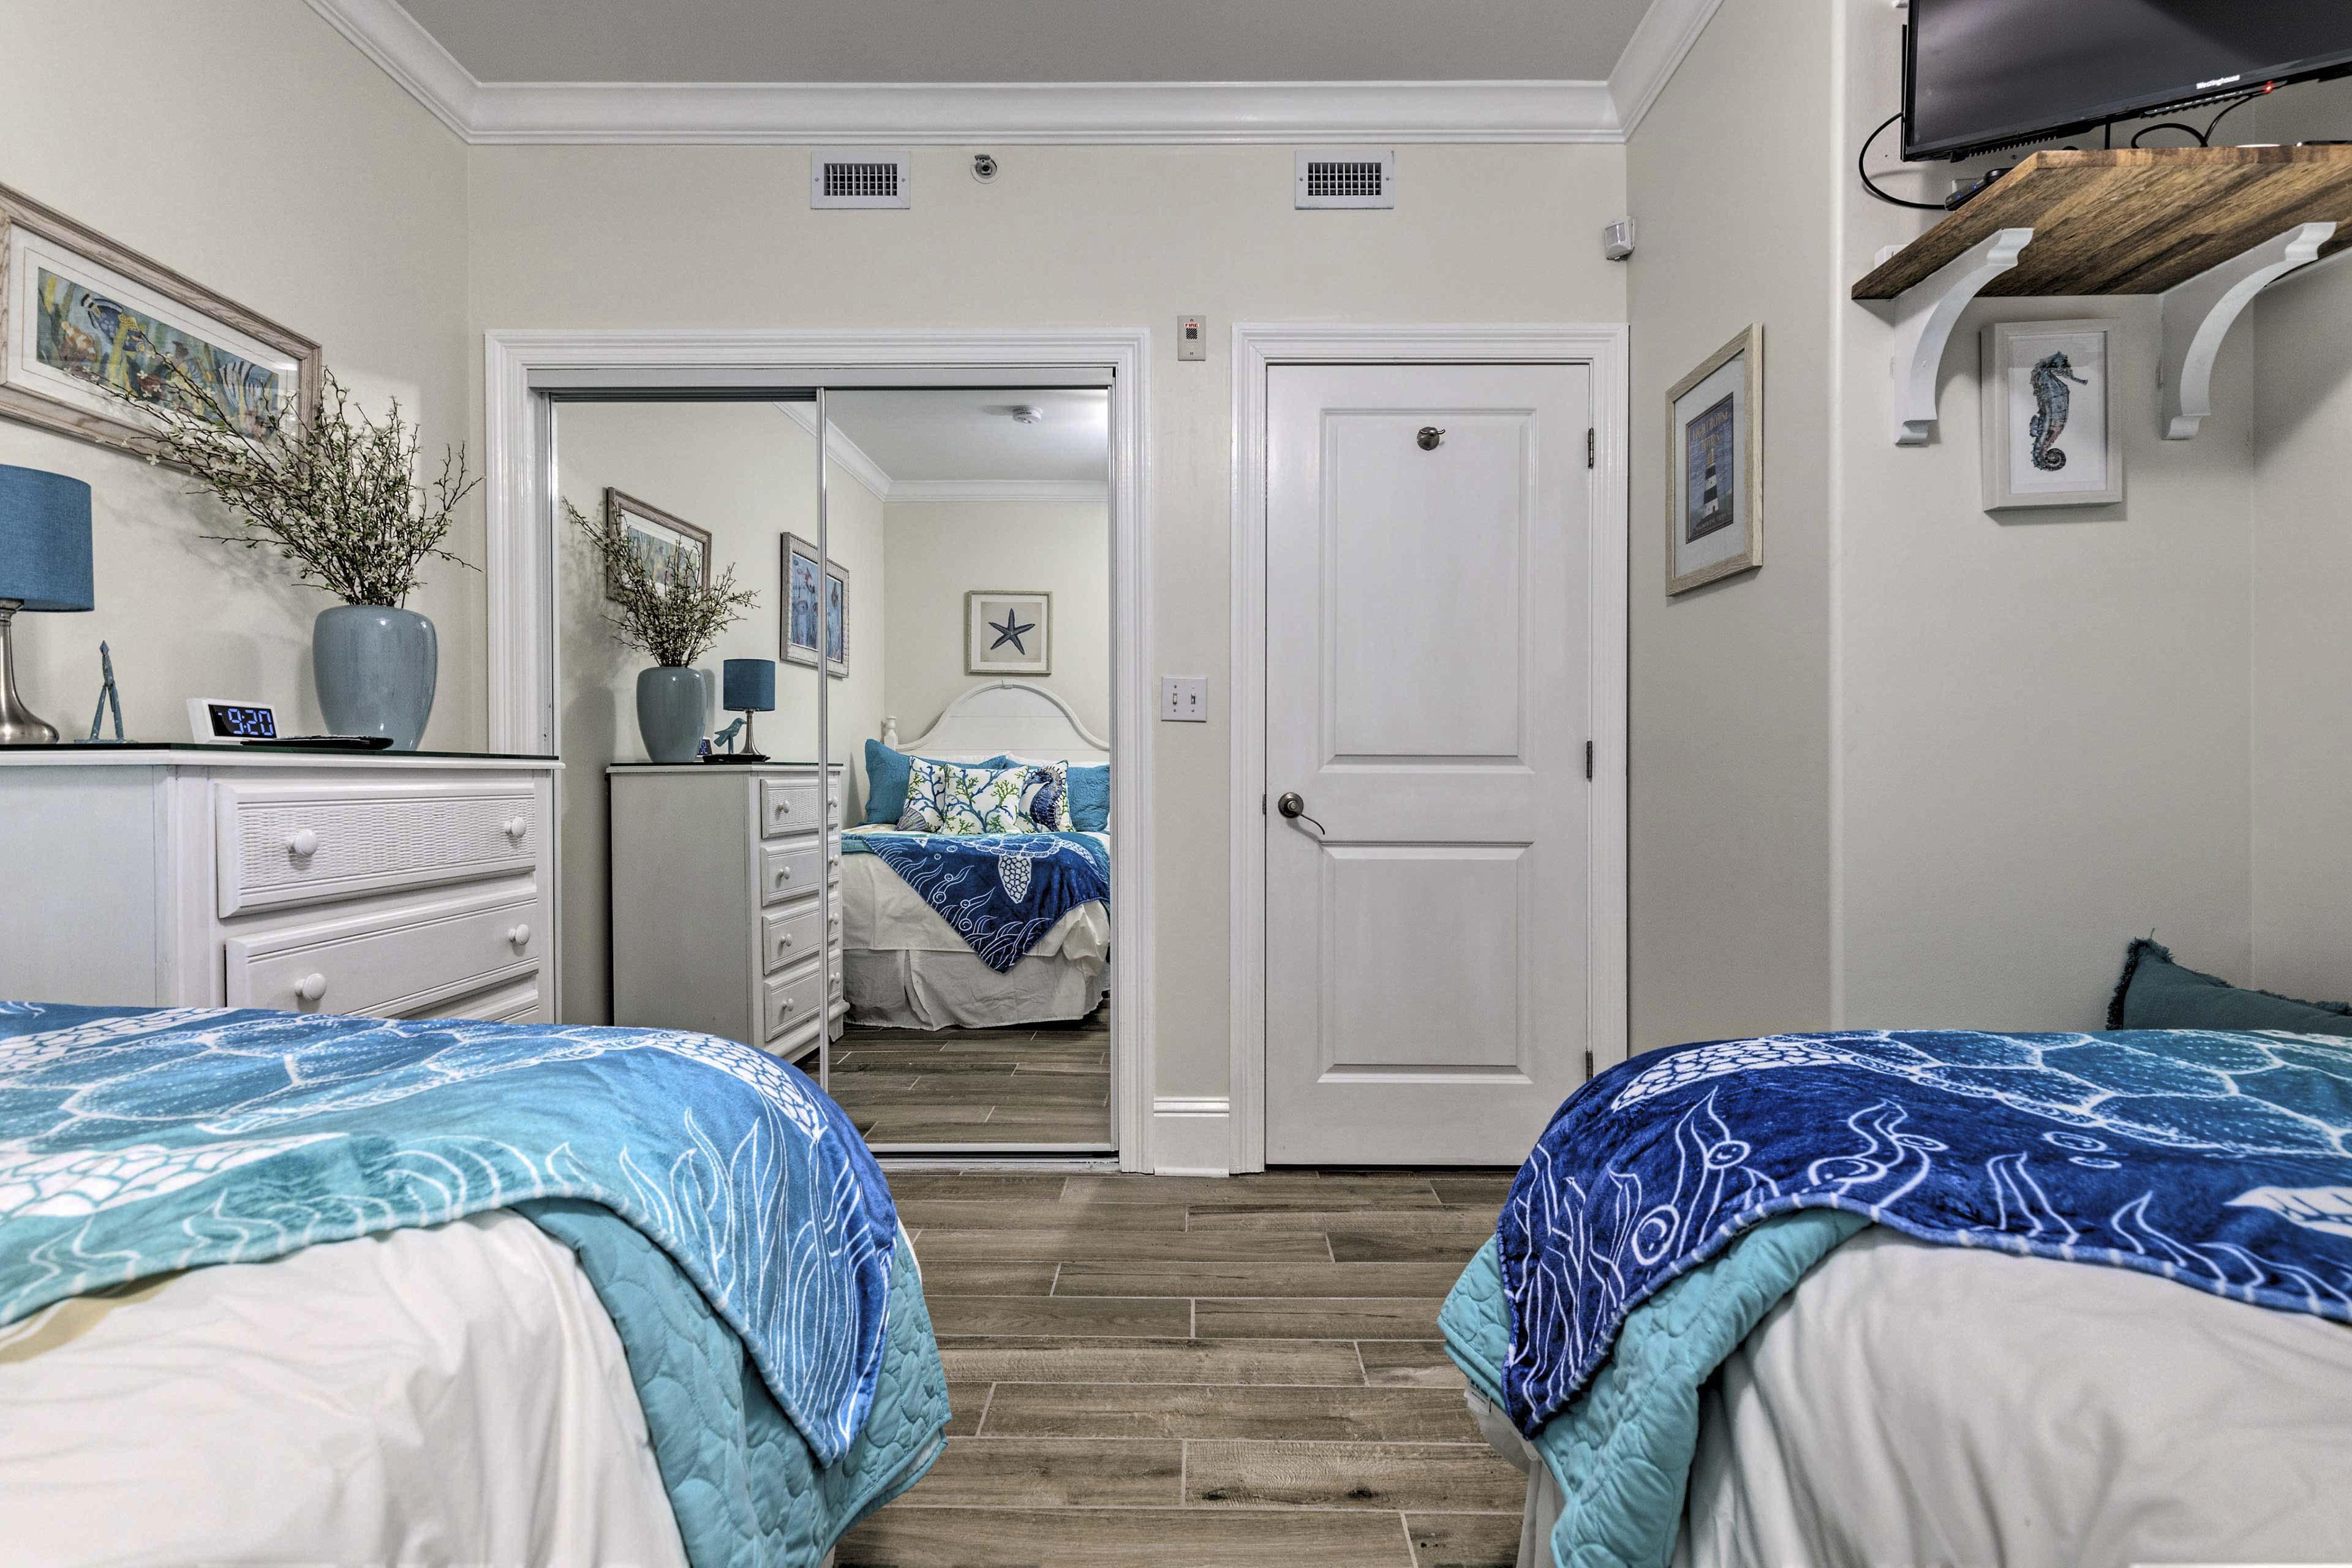 Bedroom 3 | Satellite TV